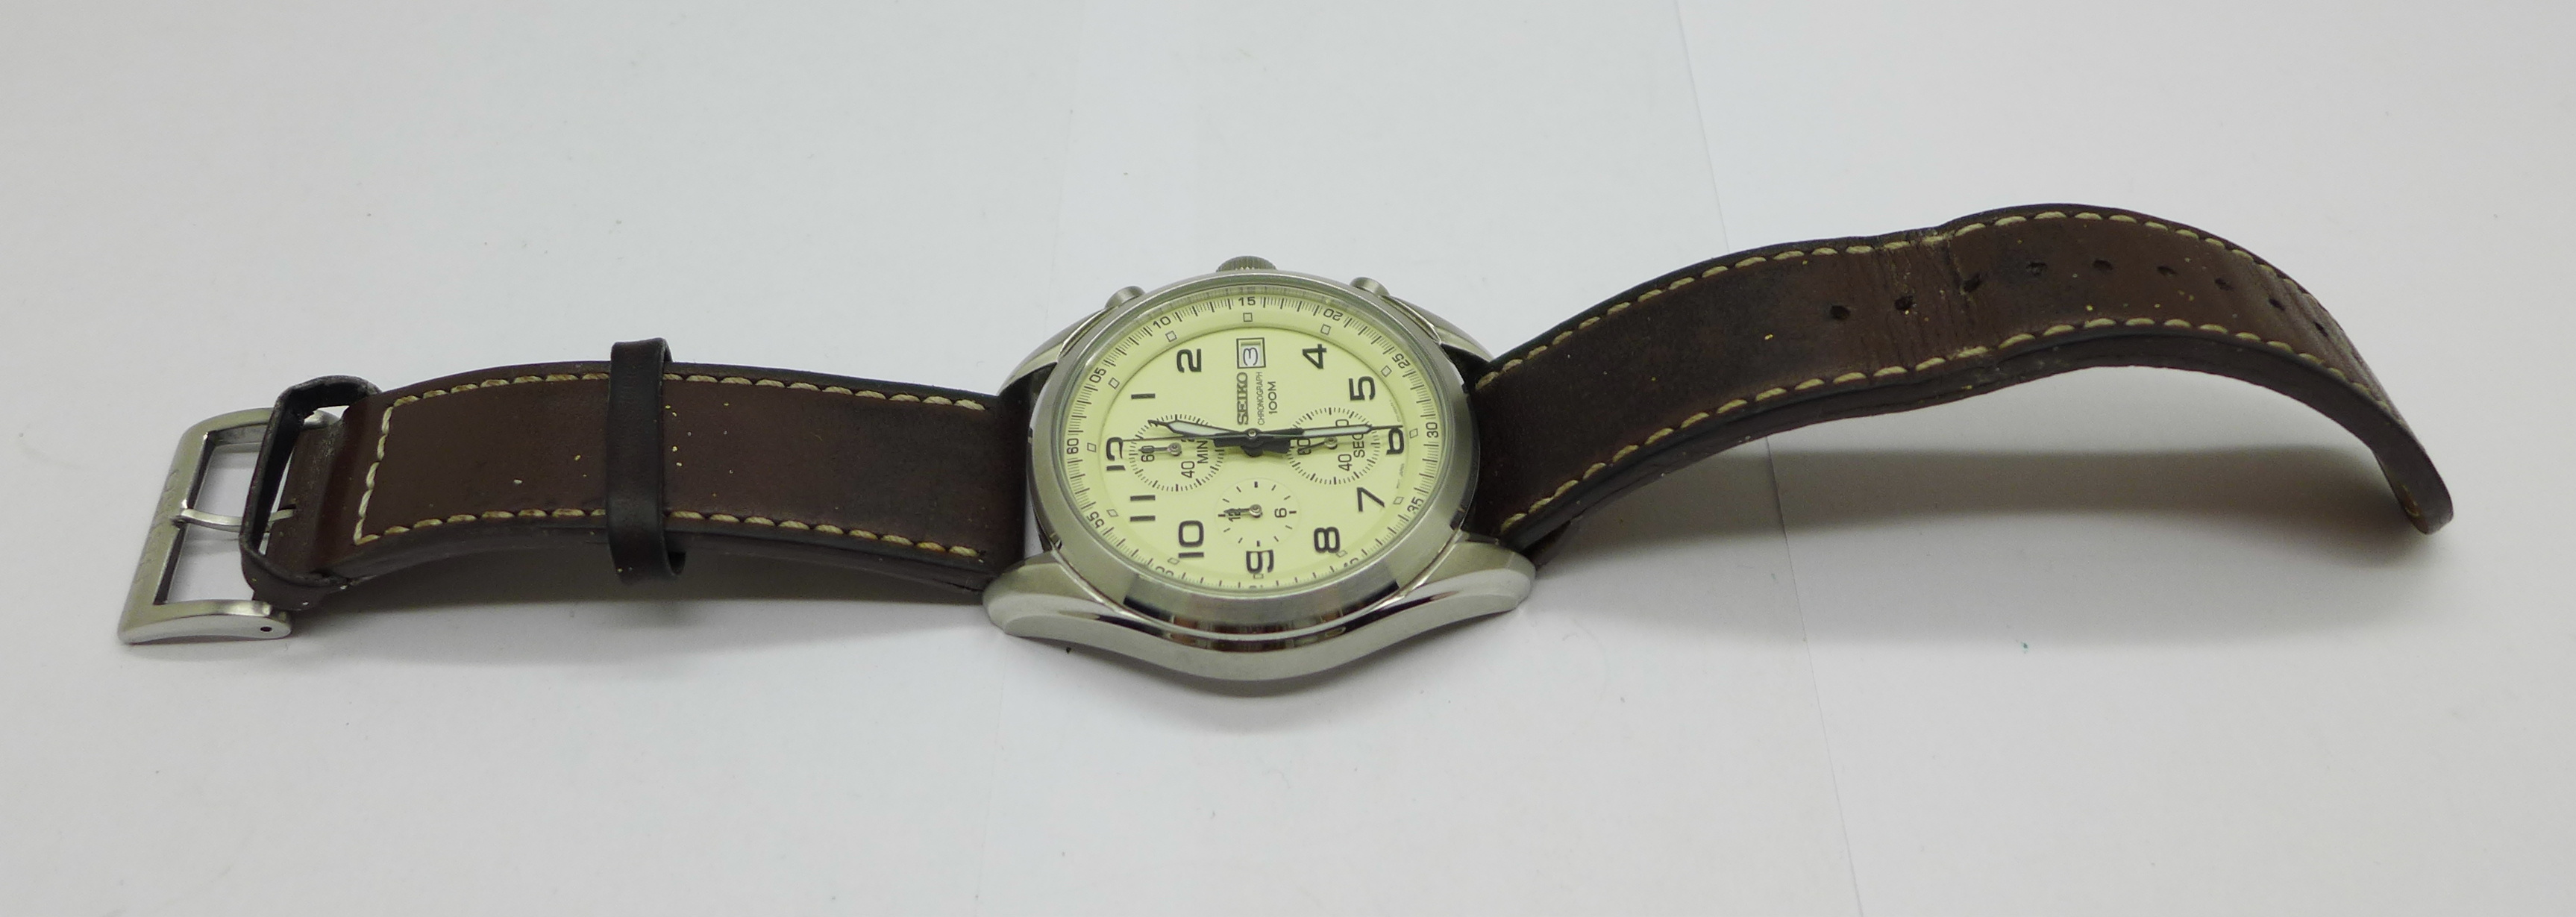 A Seiko chronograph wristwatch - Image 5 of 6